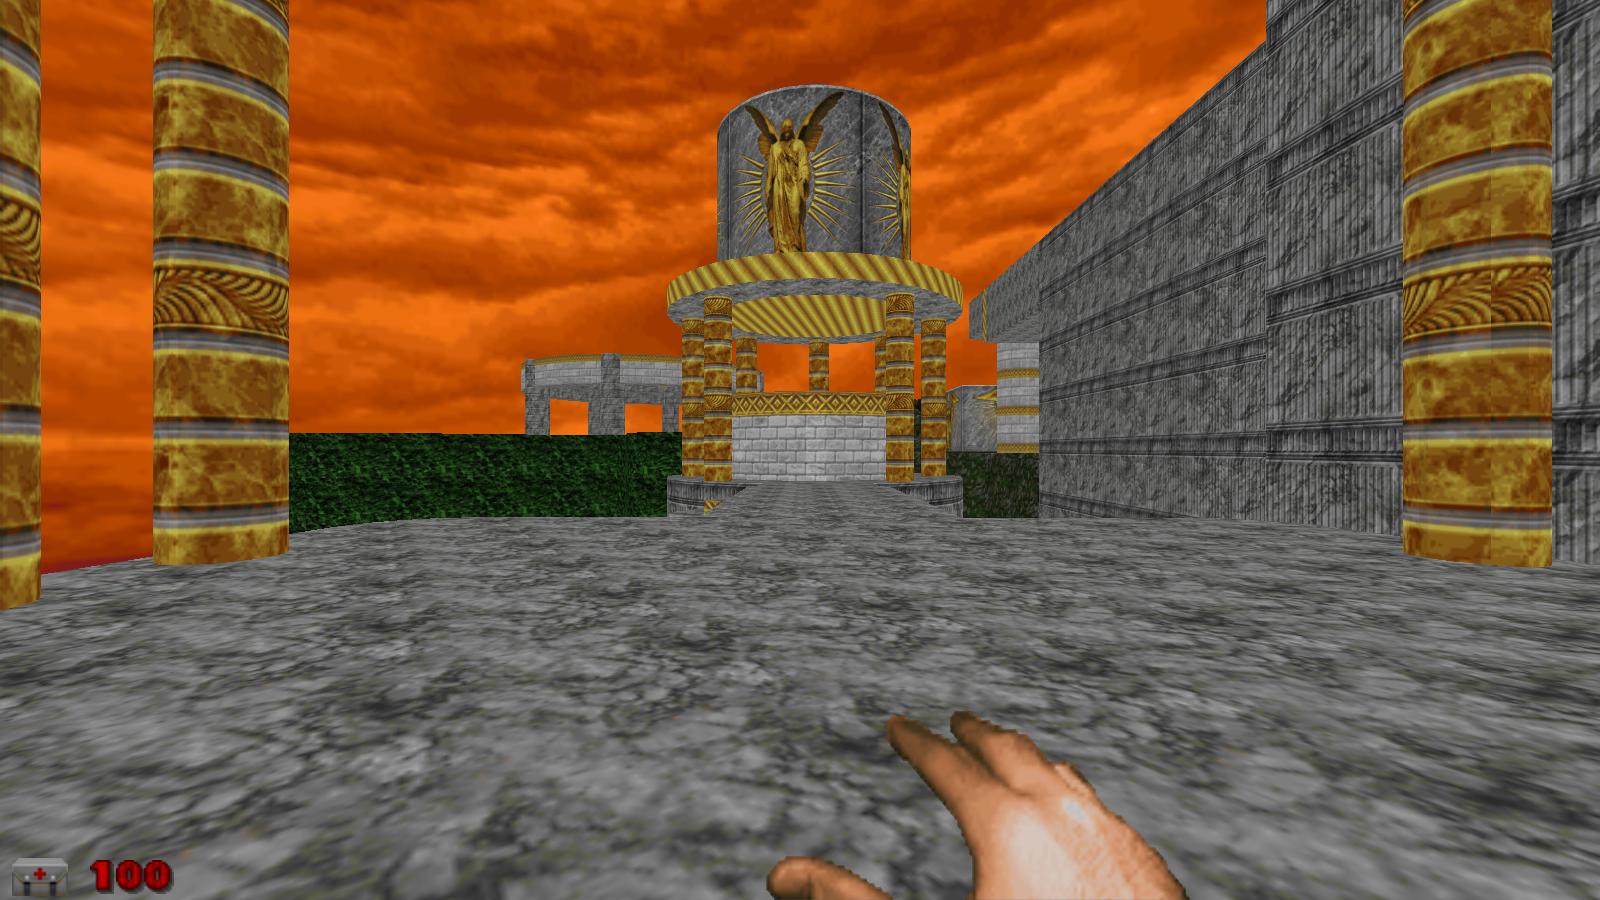 Screenshot_Doom_20200209_183308.png.581c8c353c37785099ef13ab87f8d77f.png